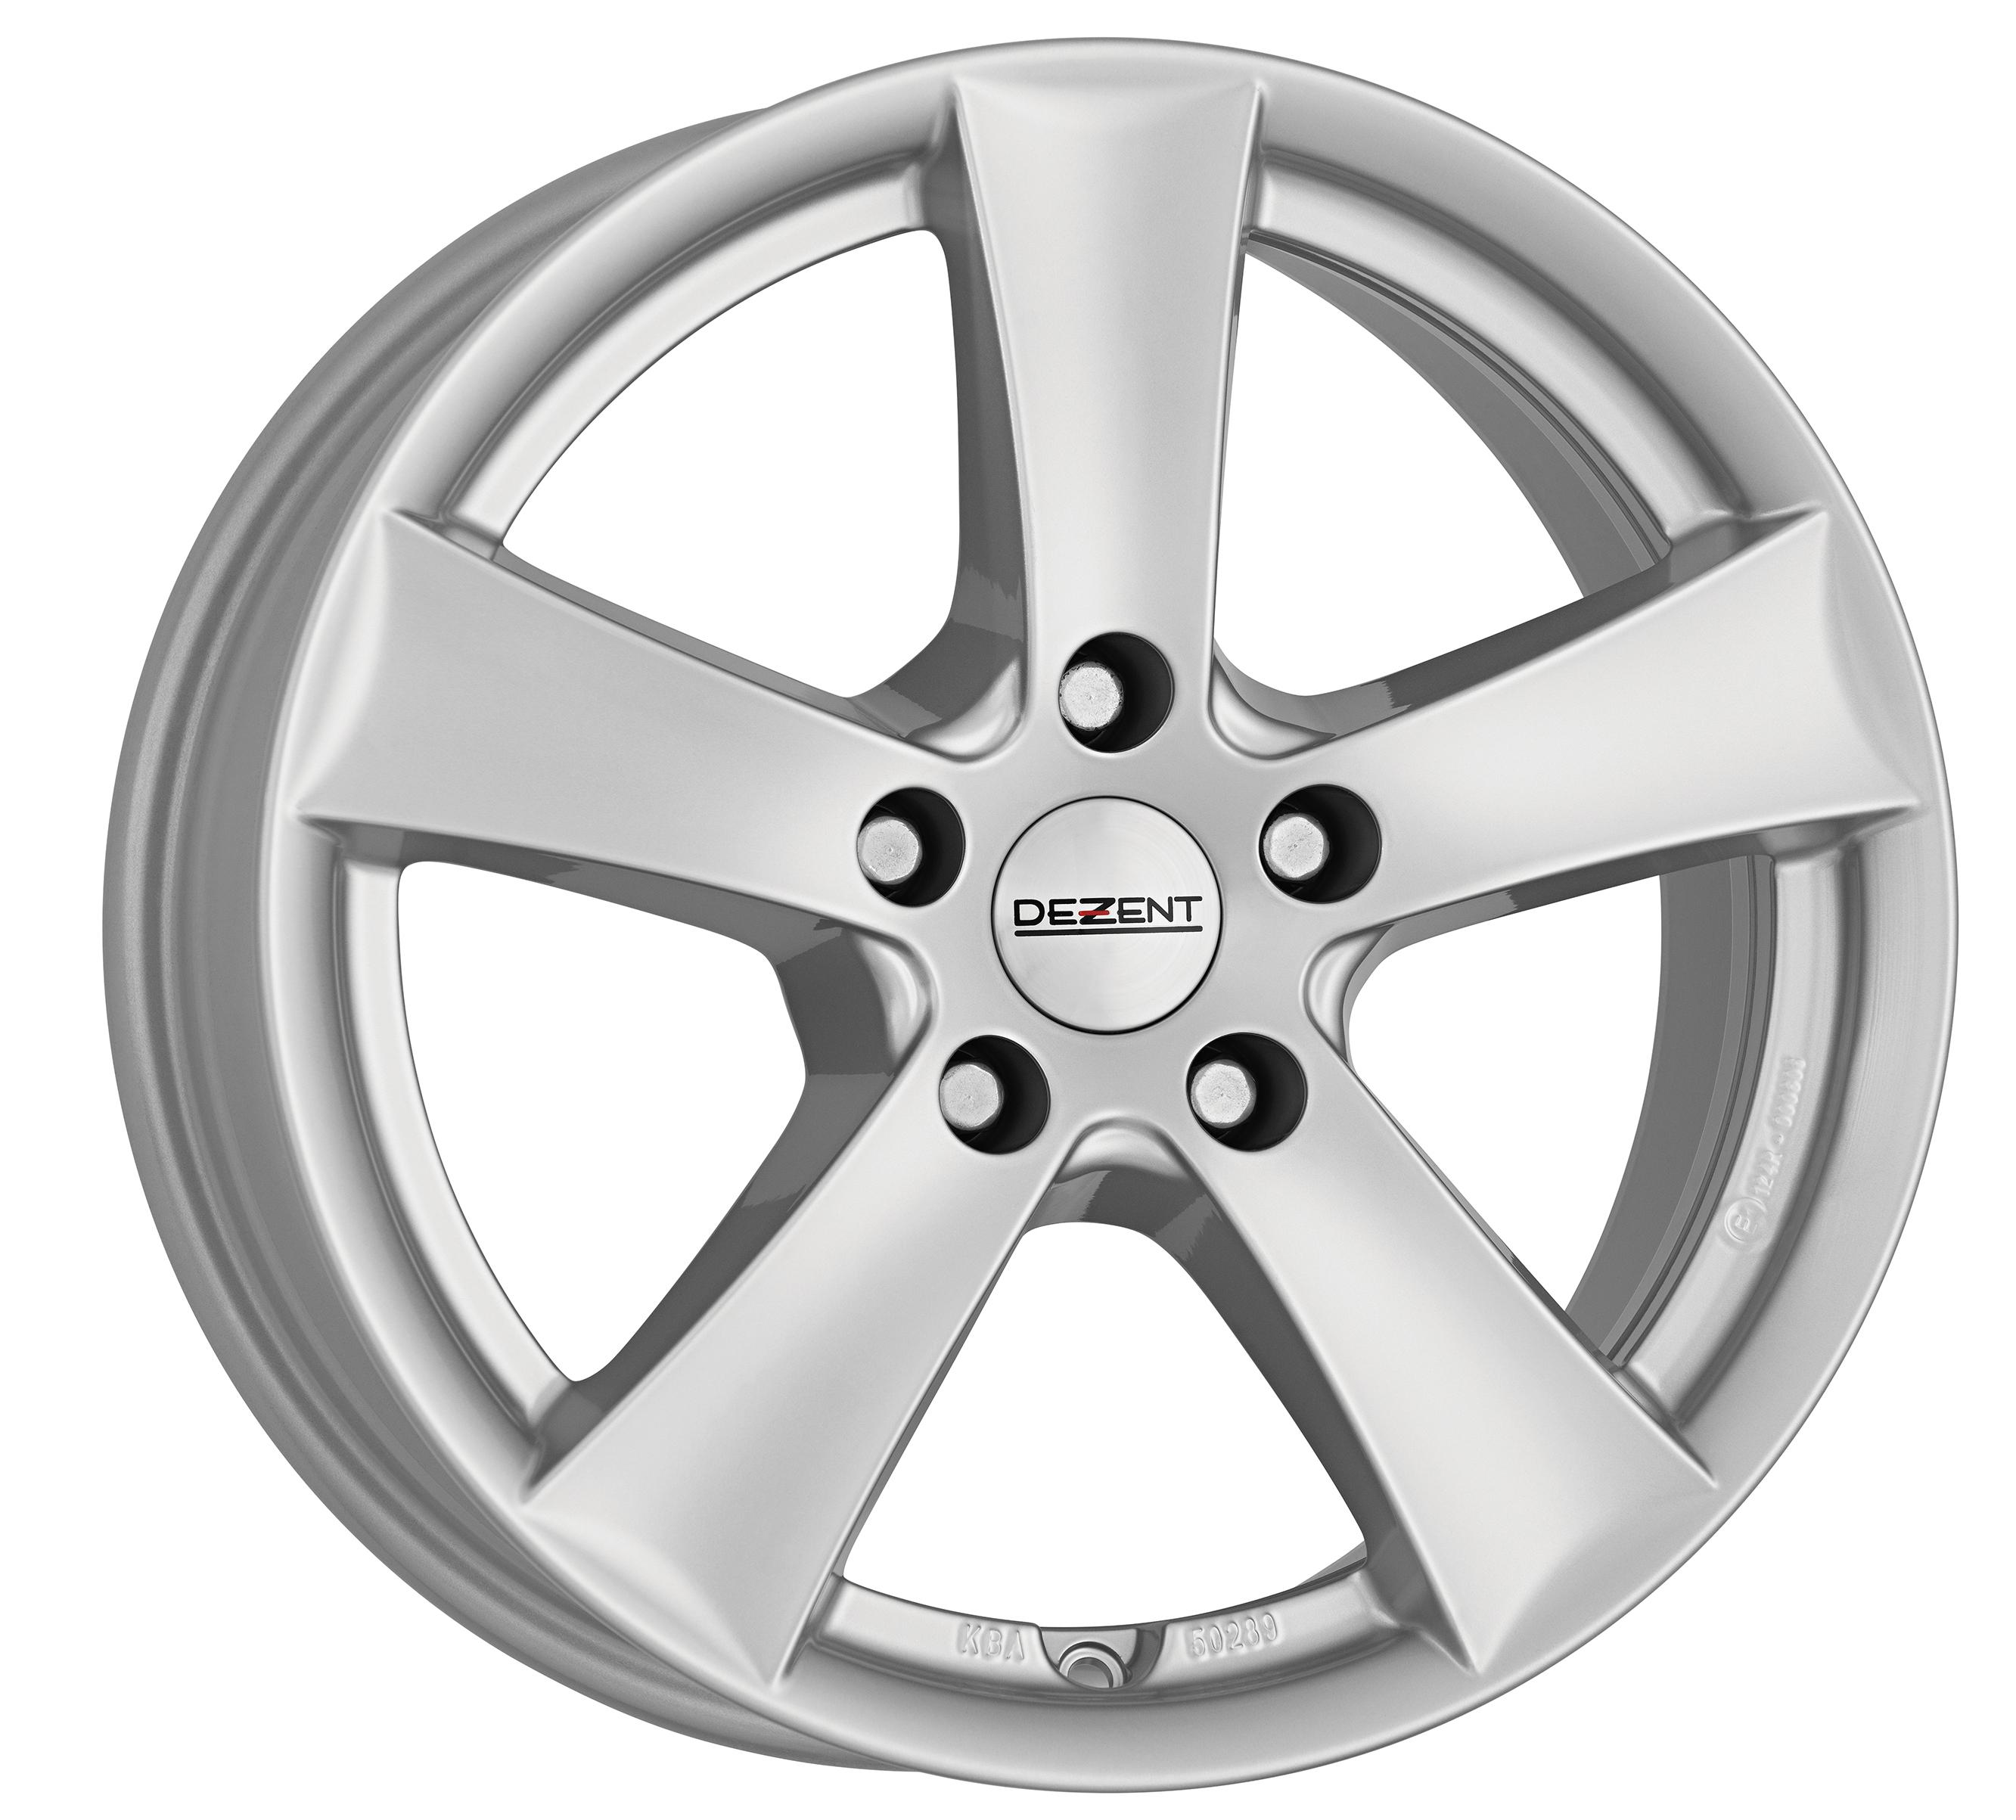 DEZENT TX 14 Silver inch velg